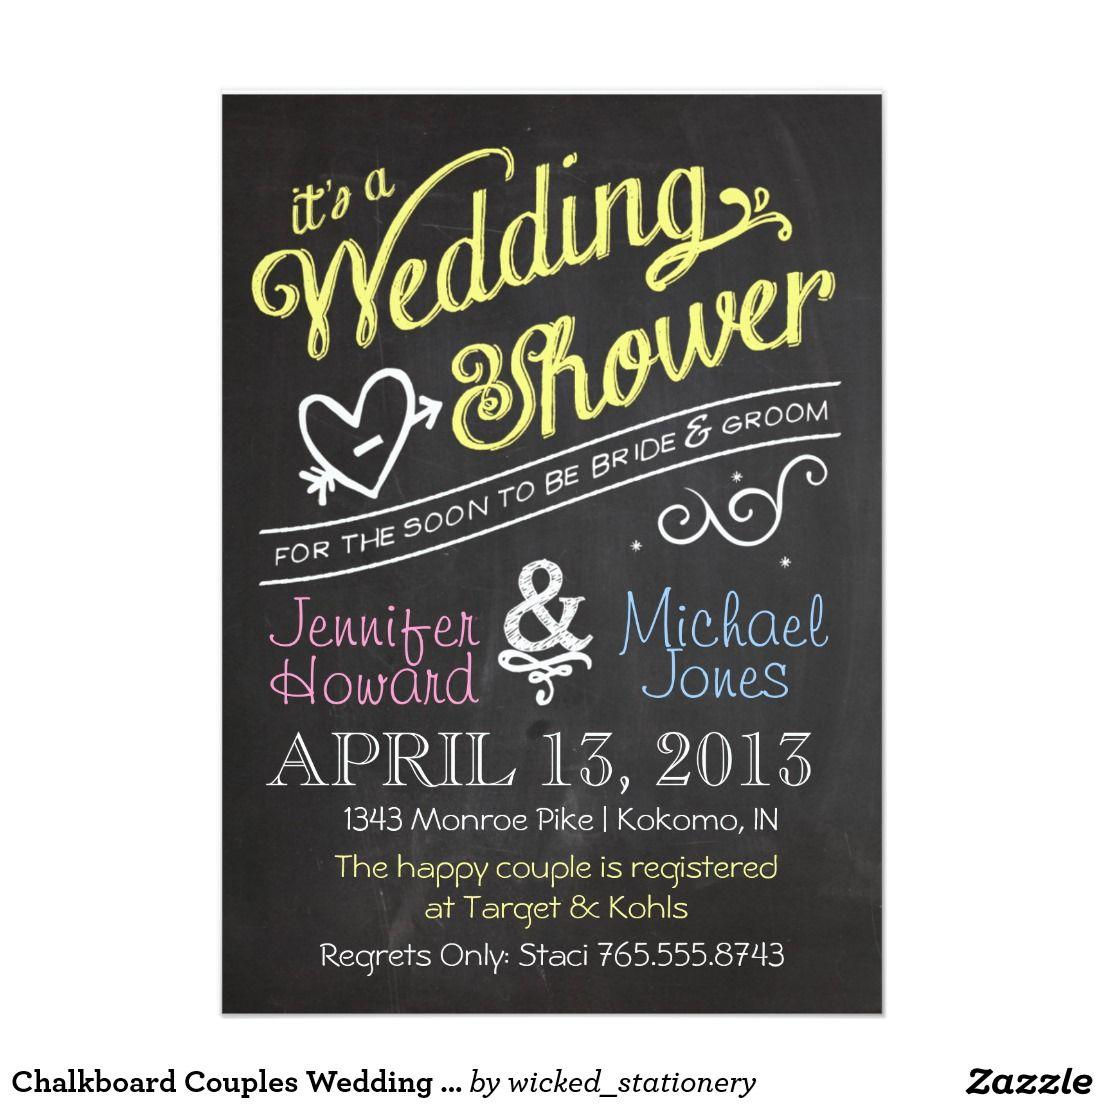 Chalkboard Couples Wedding Shower Invitation | Chalkboard Bridal ...